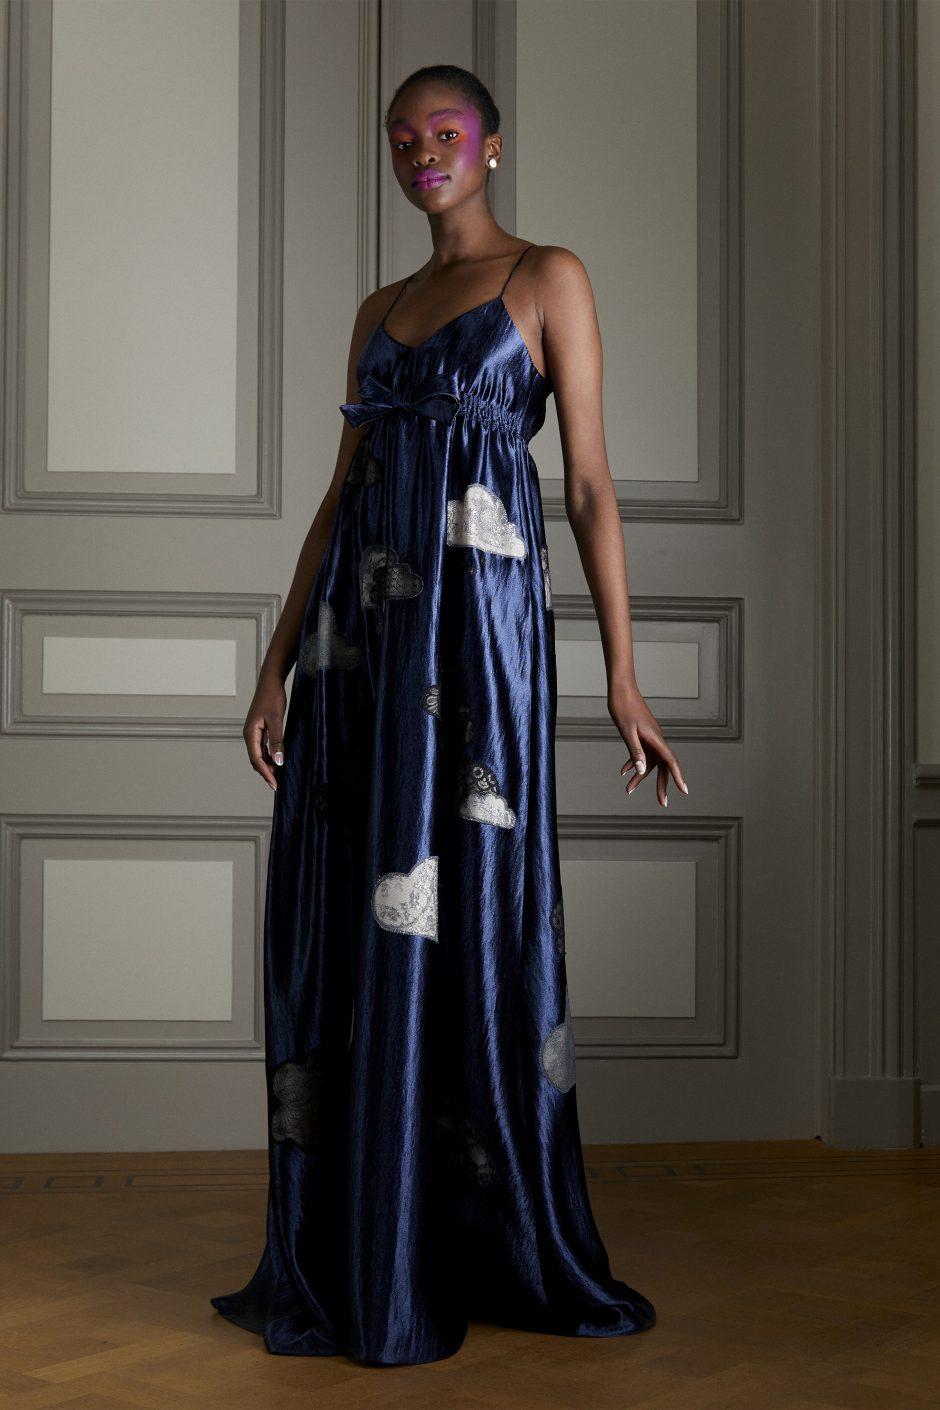 00001-Viktor-Rolf-Couture-FALL-20-Credit-Casper-Kofi